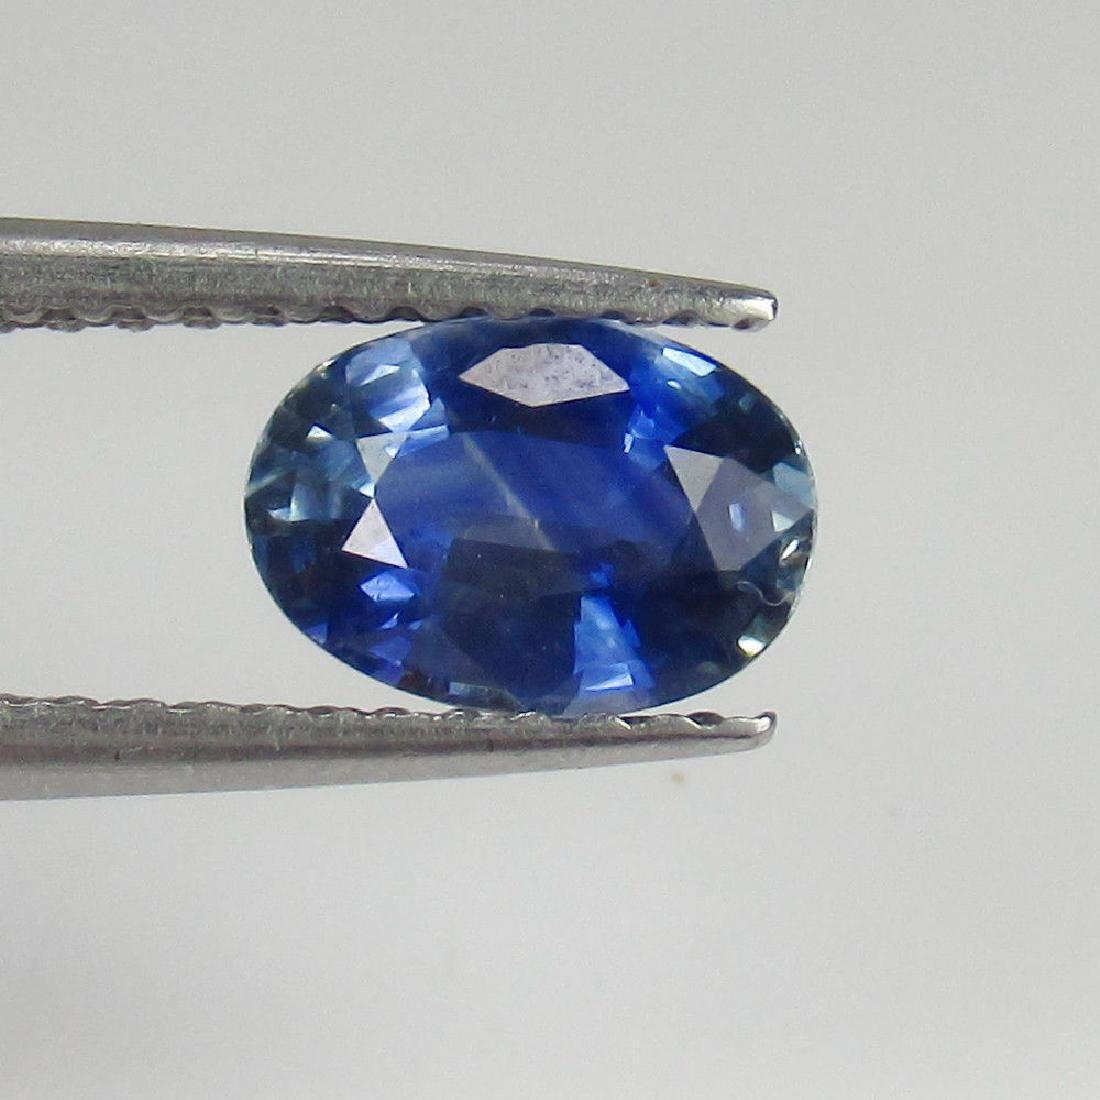 1.00 Ct Genuine Ceylon Blue Sapphire Top Quality Luster